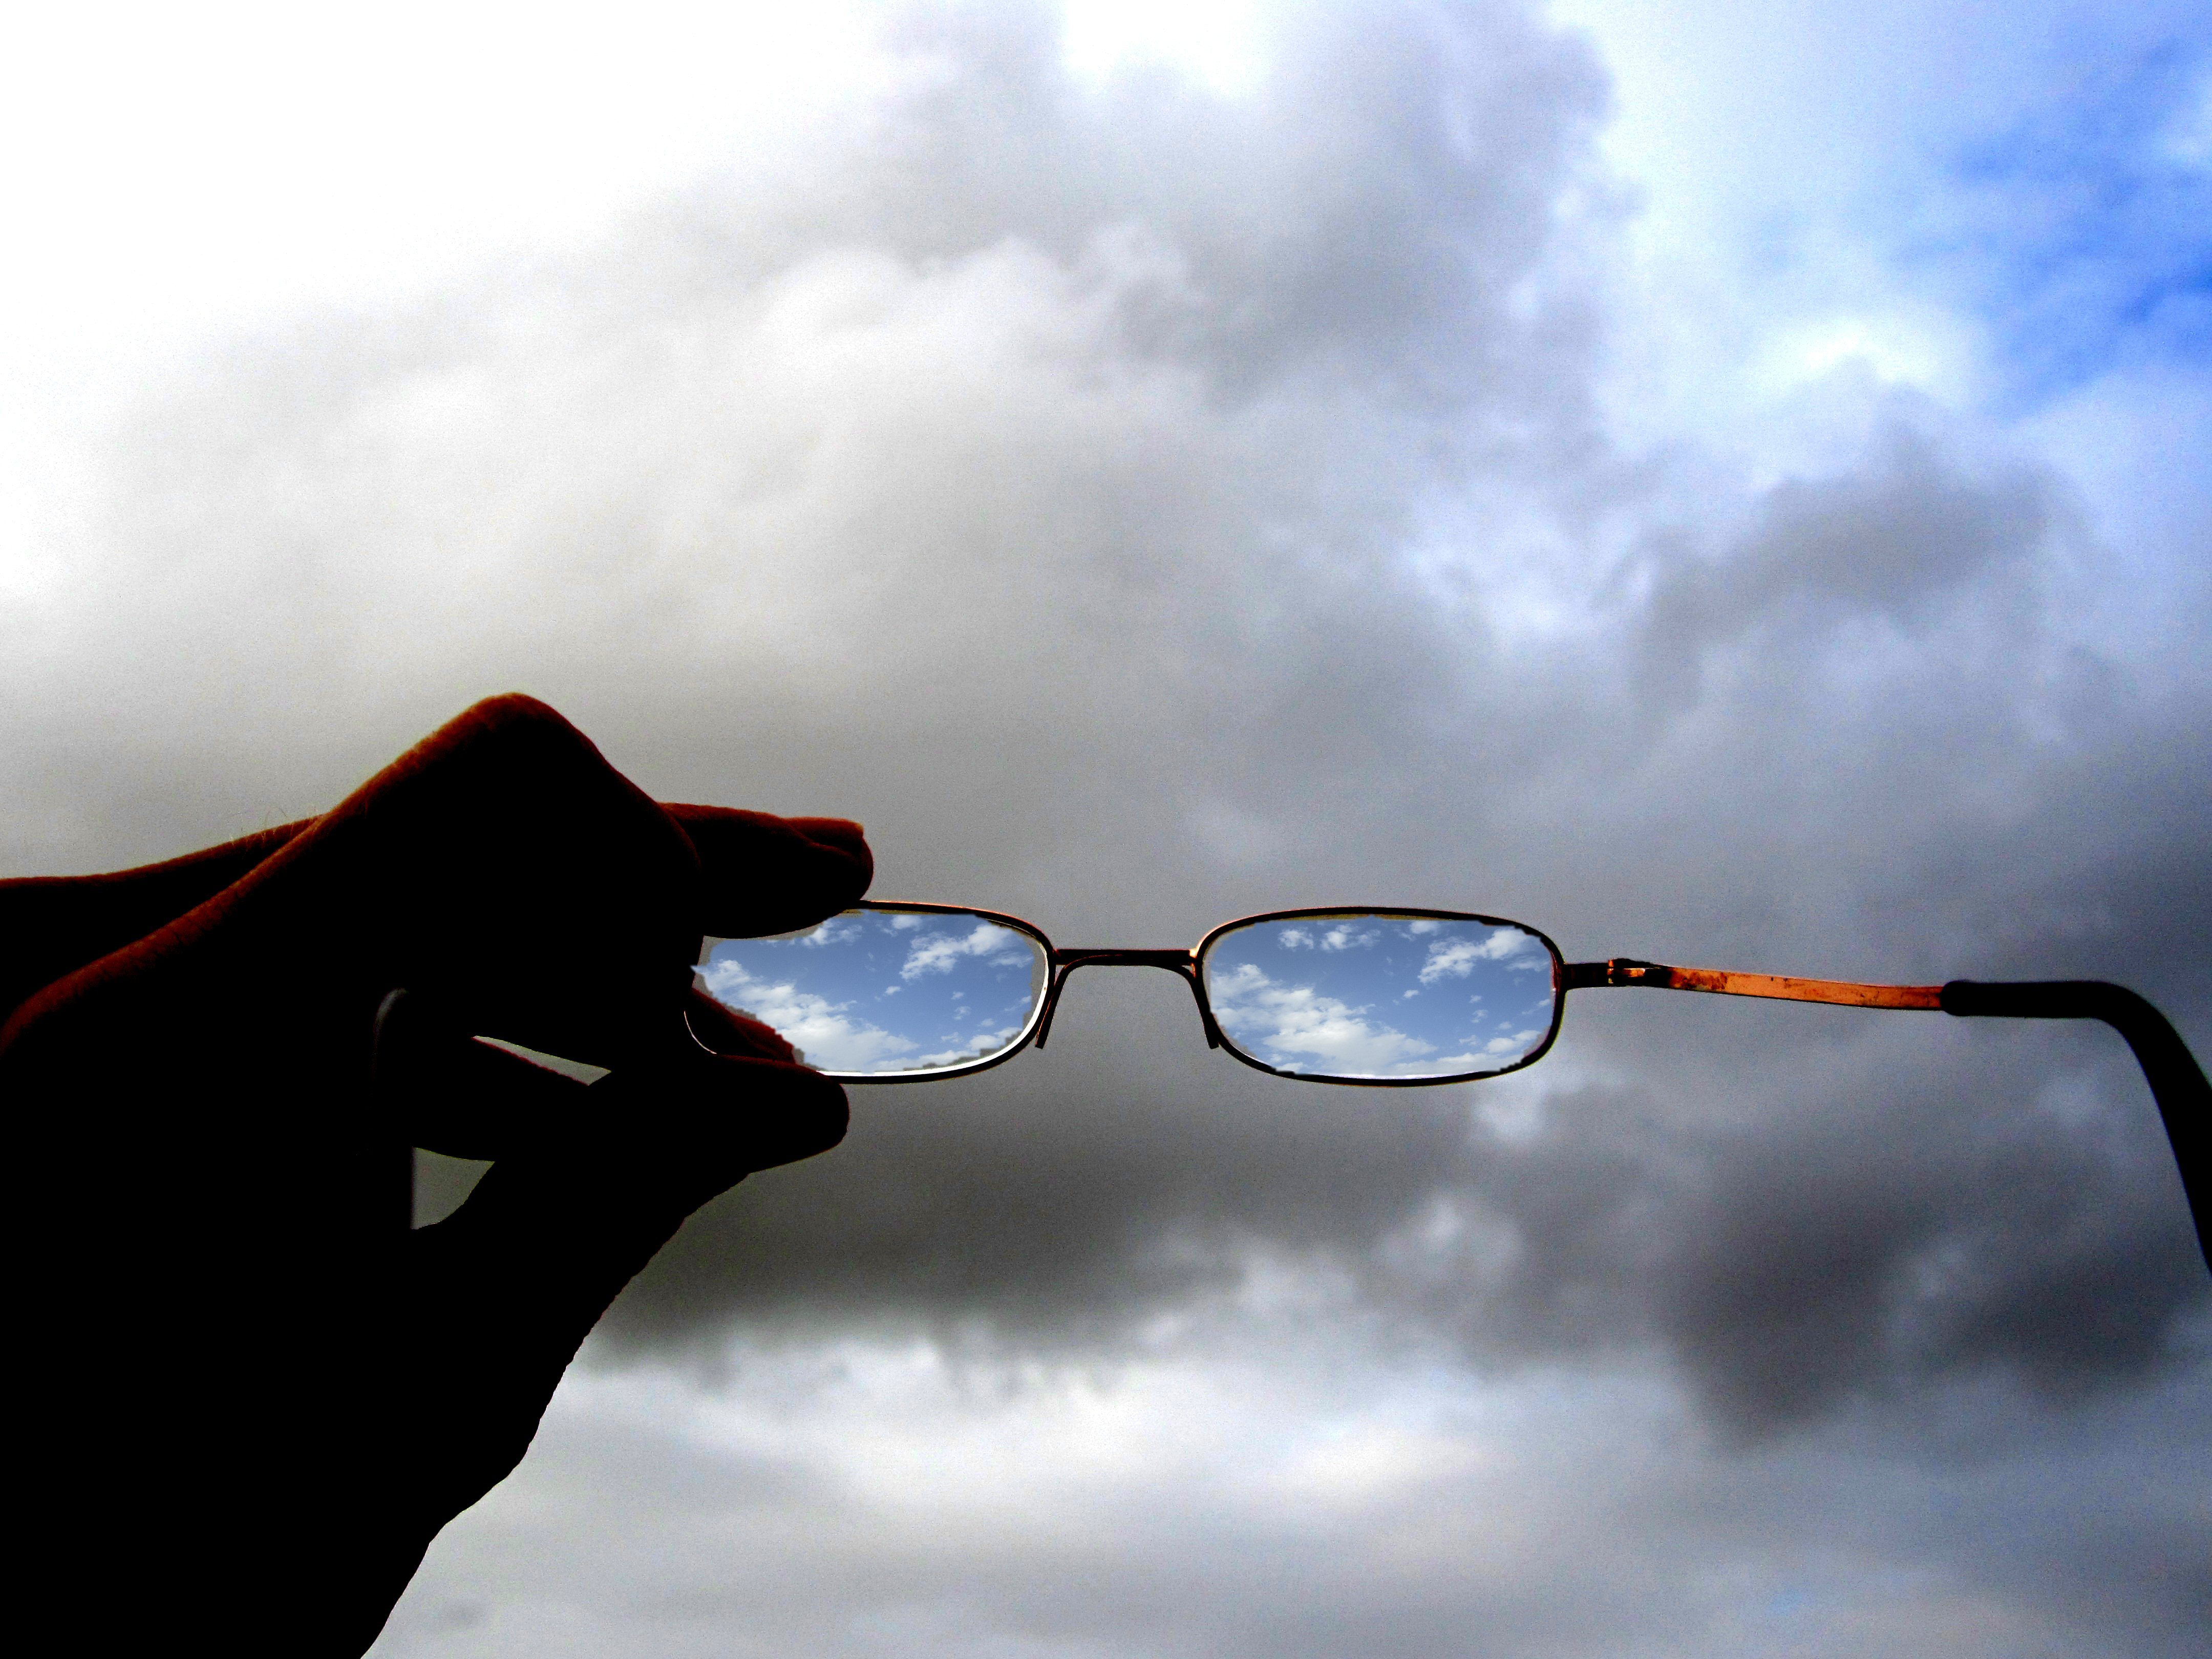 Optimistic glases